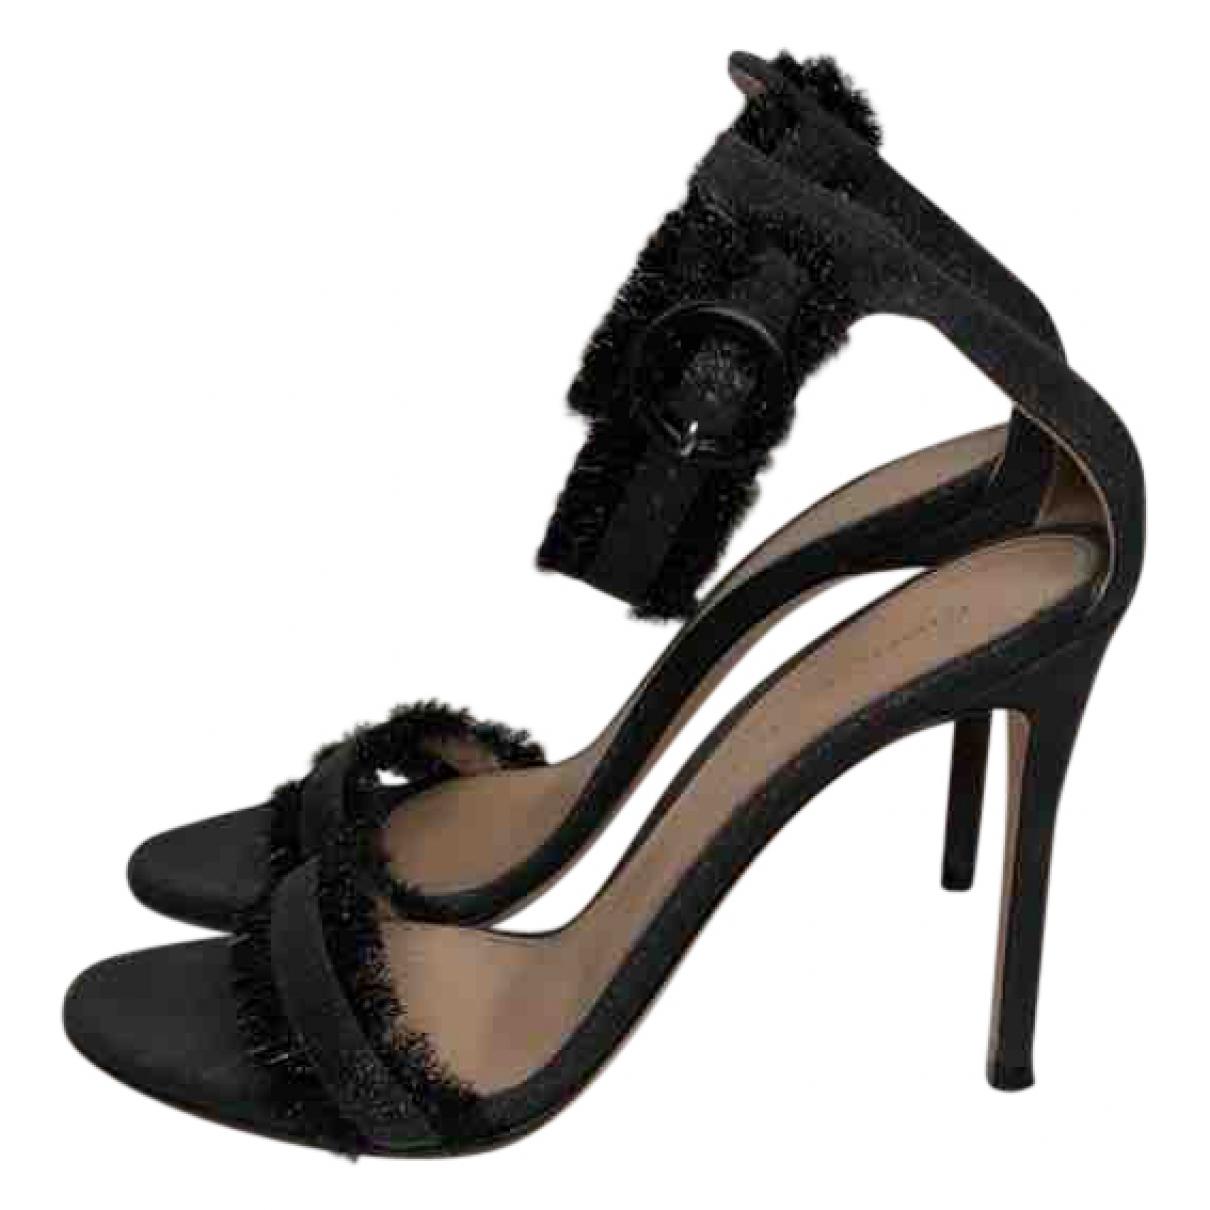 Sandalias de Lona Gianvito Rossi